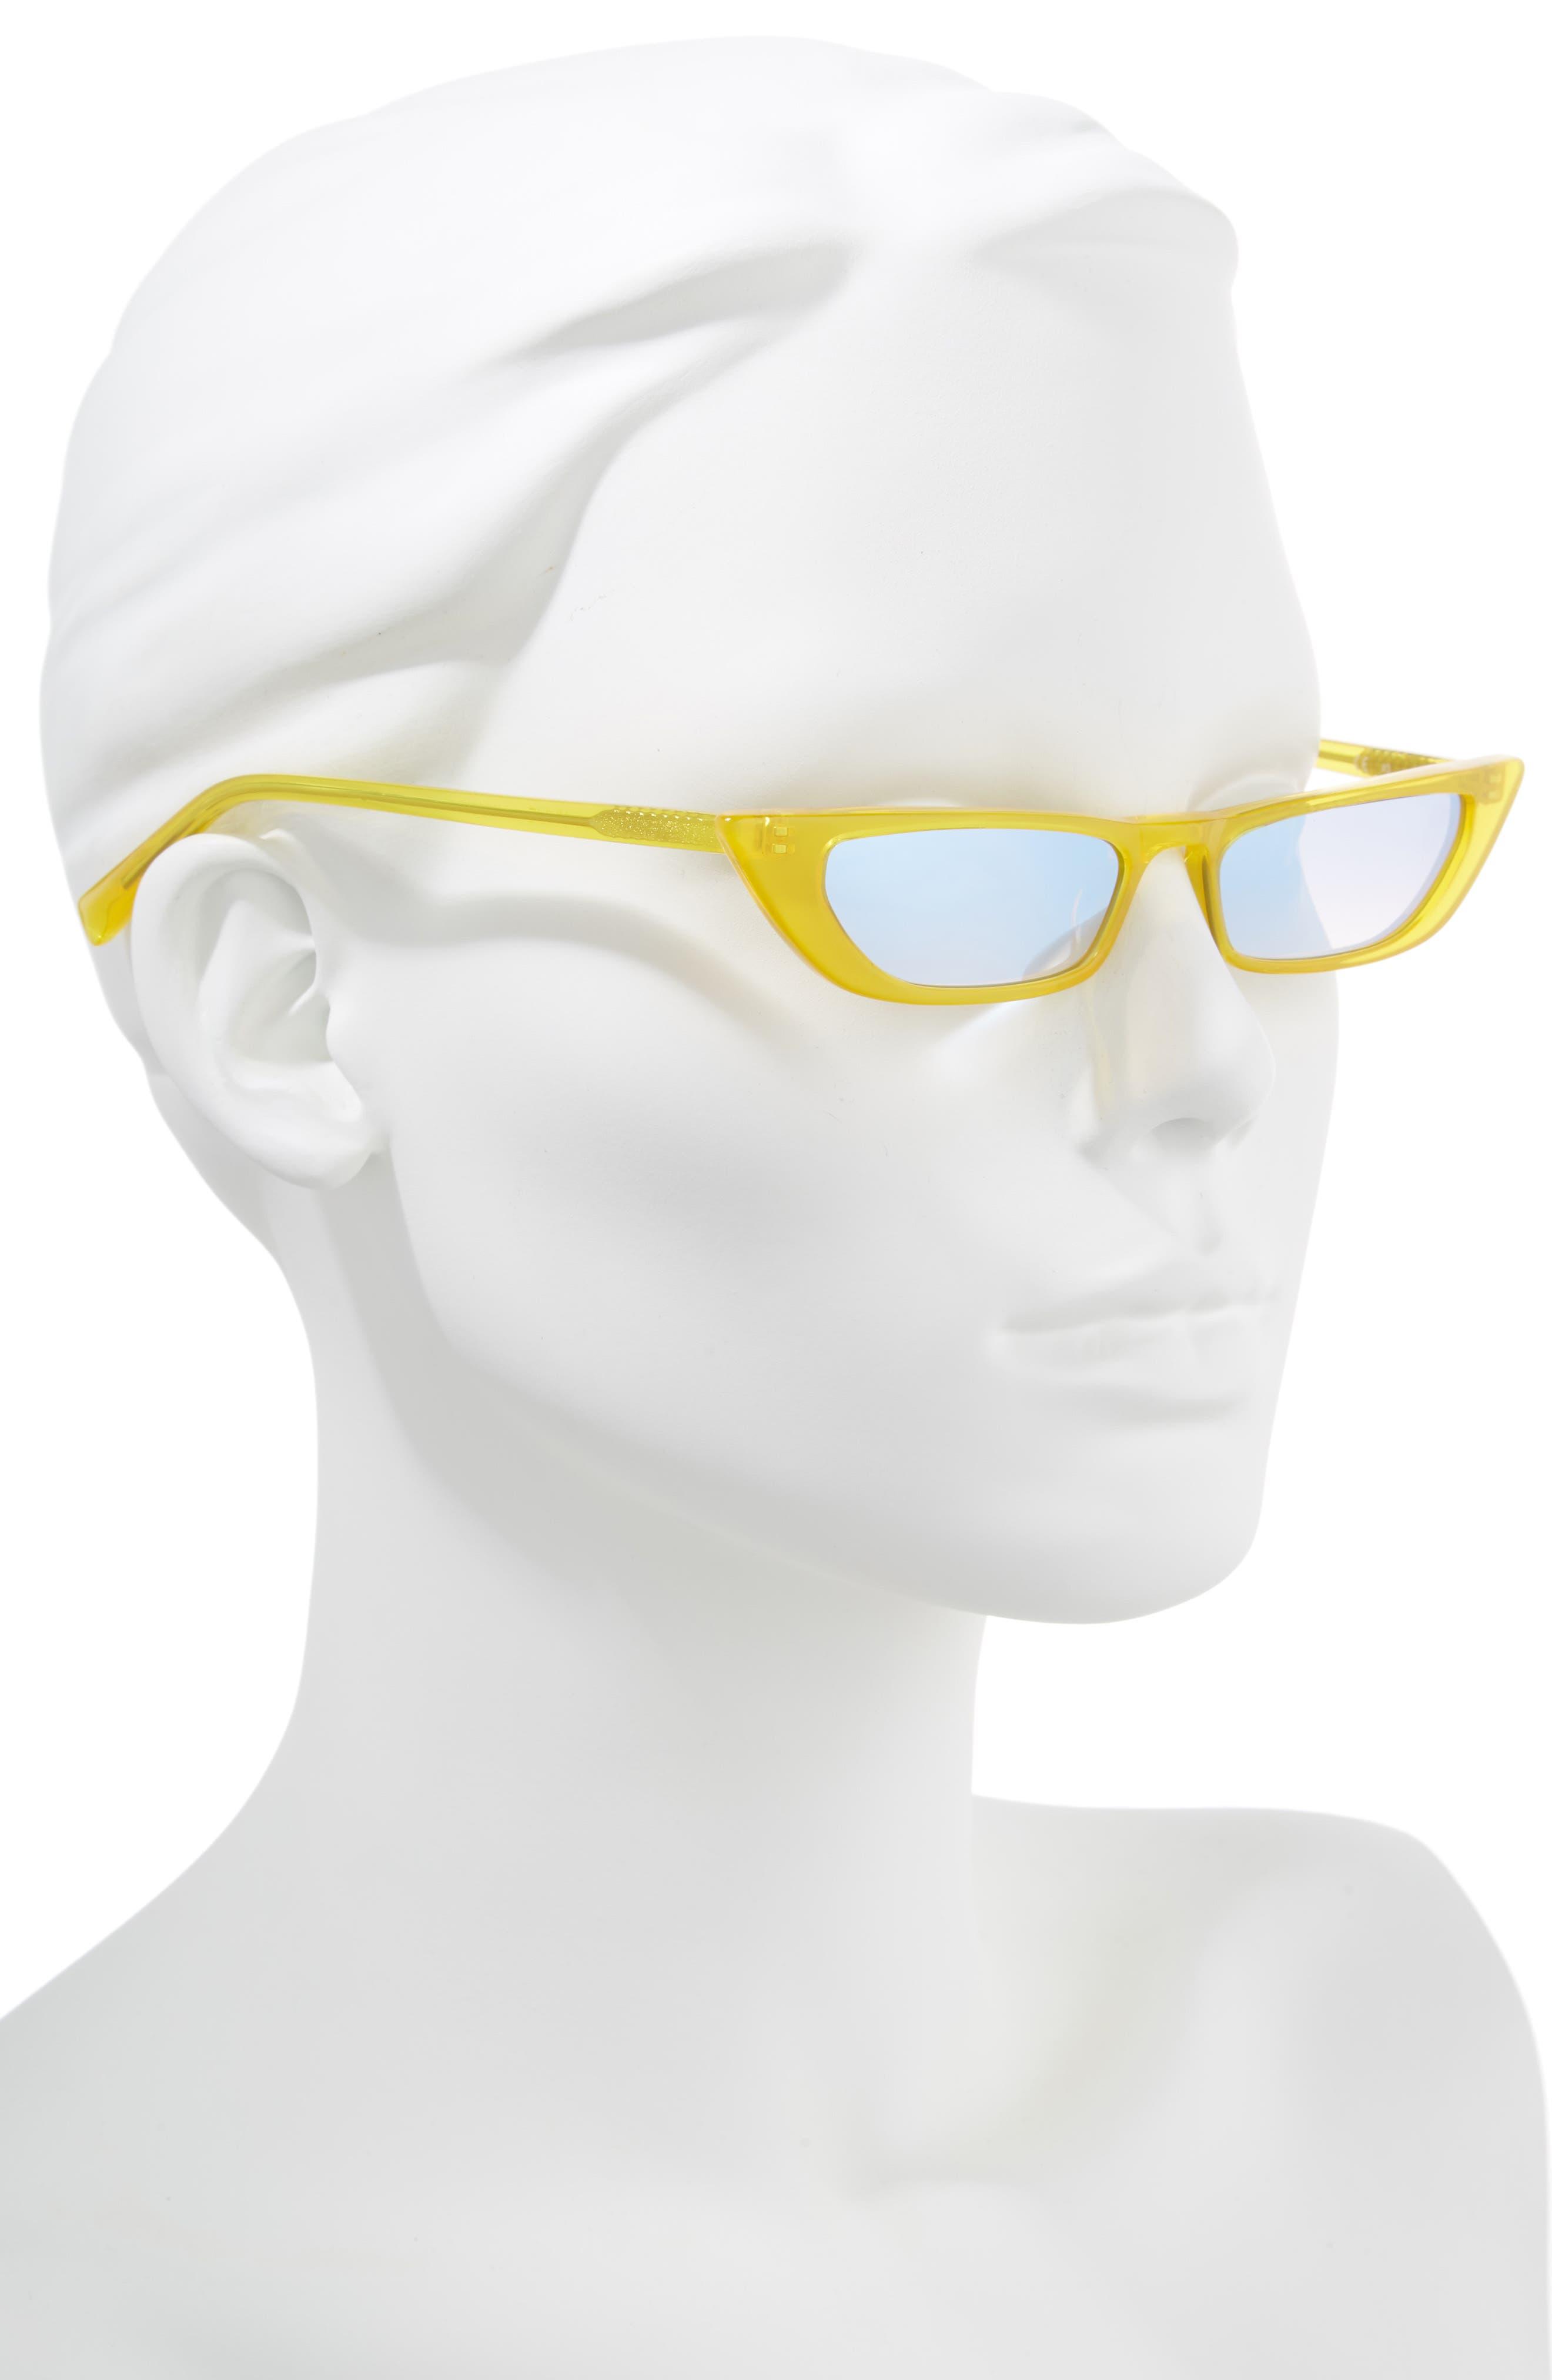 Vivian Extreme 51mm Cat Eye Sunglasses,                             Alternate thumbnail 2, color,                             SUN CITY YELLOW/ SOLID SMOKE